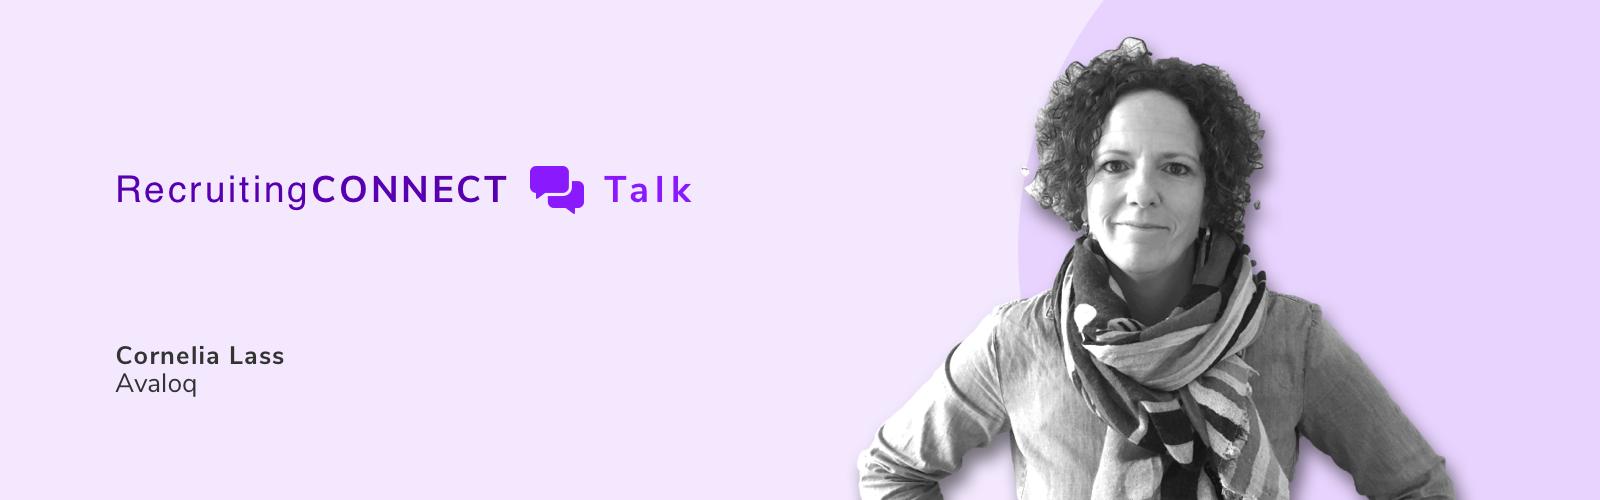 Talentry Webinar RecruitingCONNECT Talk Cornelia Lass Avaloq